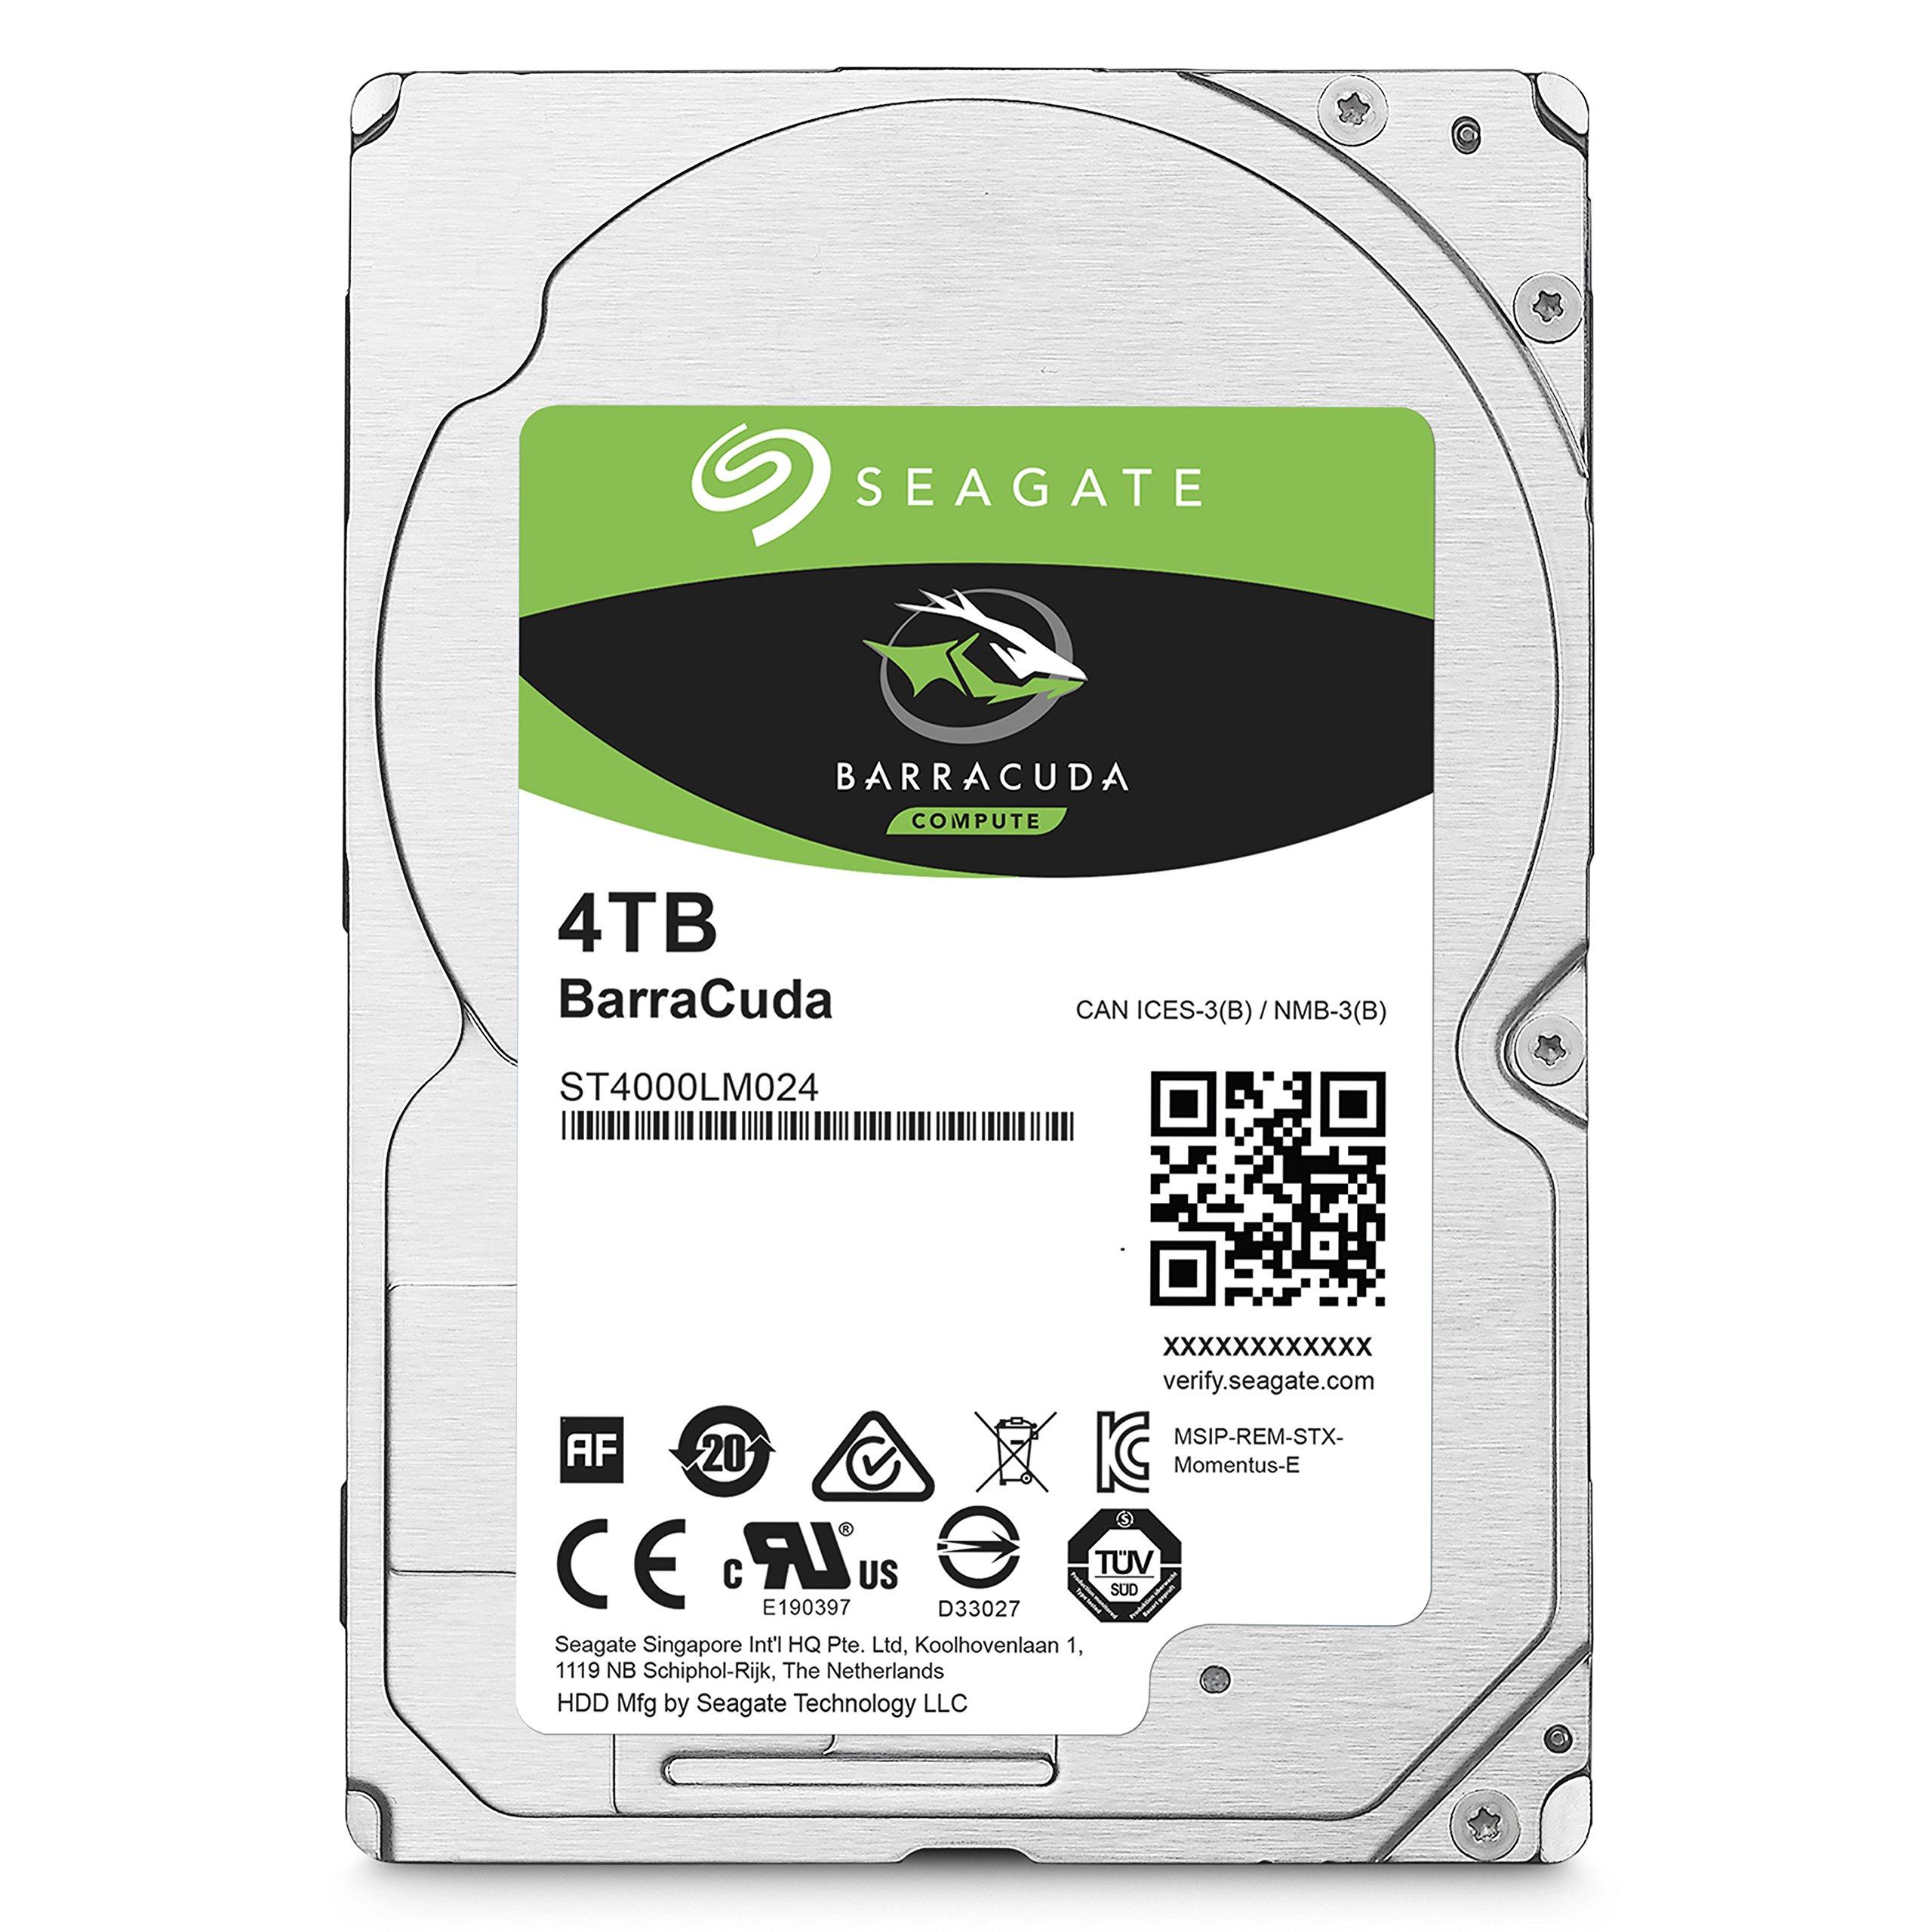 Seagate 4TB Barracuda Sata 6GB/s 128MB Cache 2.5-Inch 15mm Internal Bare/OEM Hard Drive (ST4000LM024) by Seagate